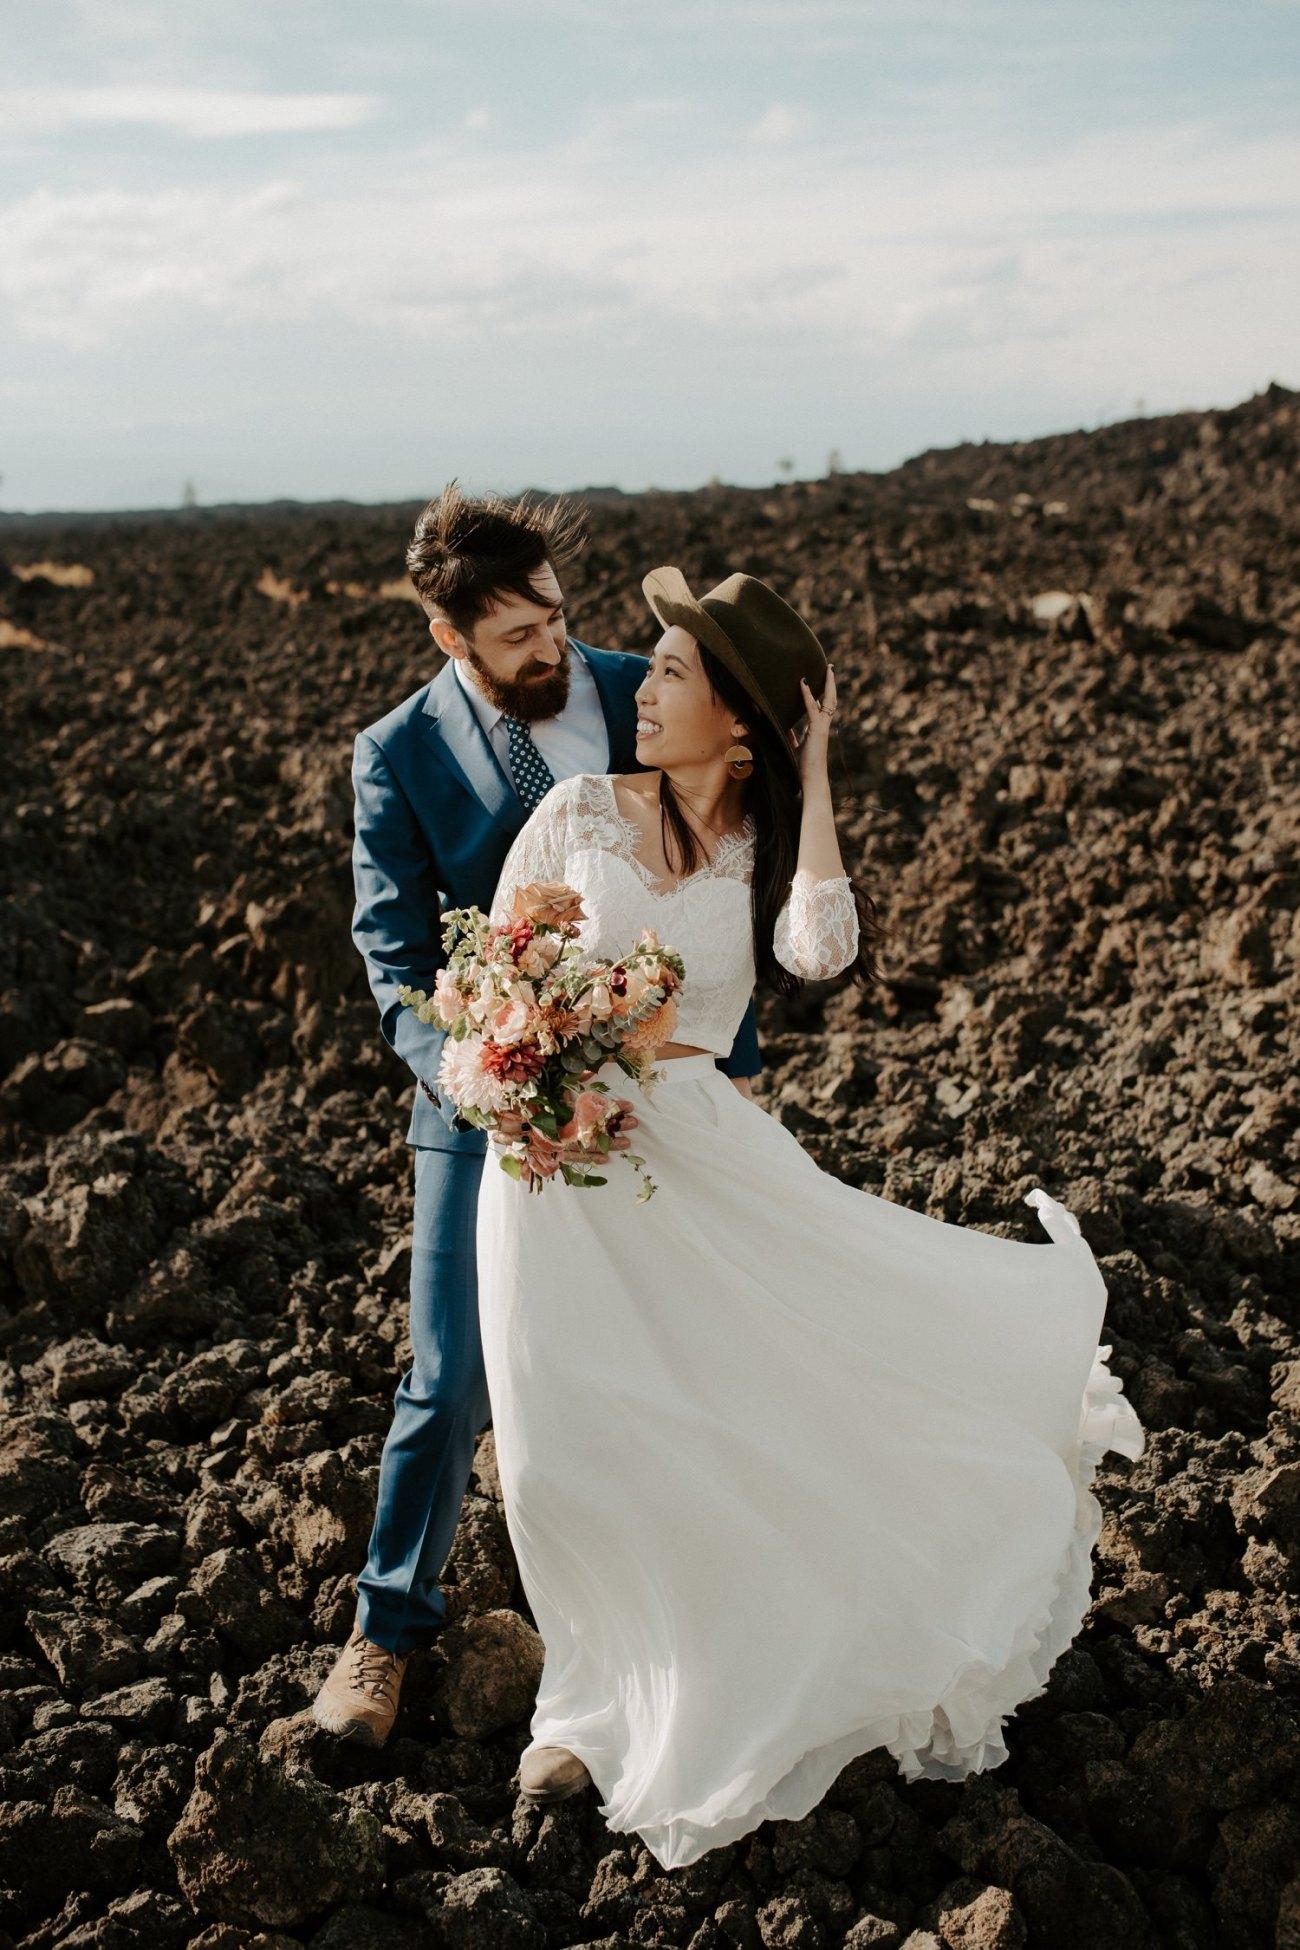 Newberry Volcano Elopement Bend Elopement Bridal Session Bend Wedding Photographer Anais Possamai Photography 005